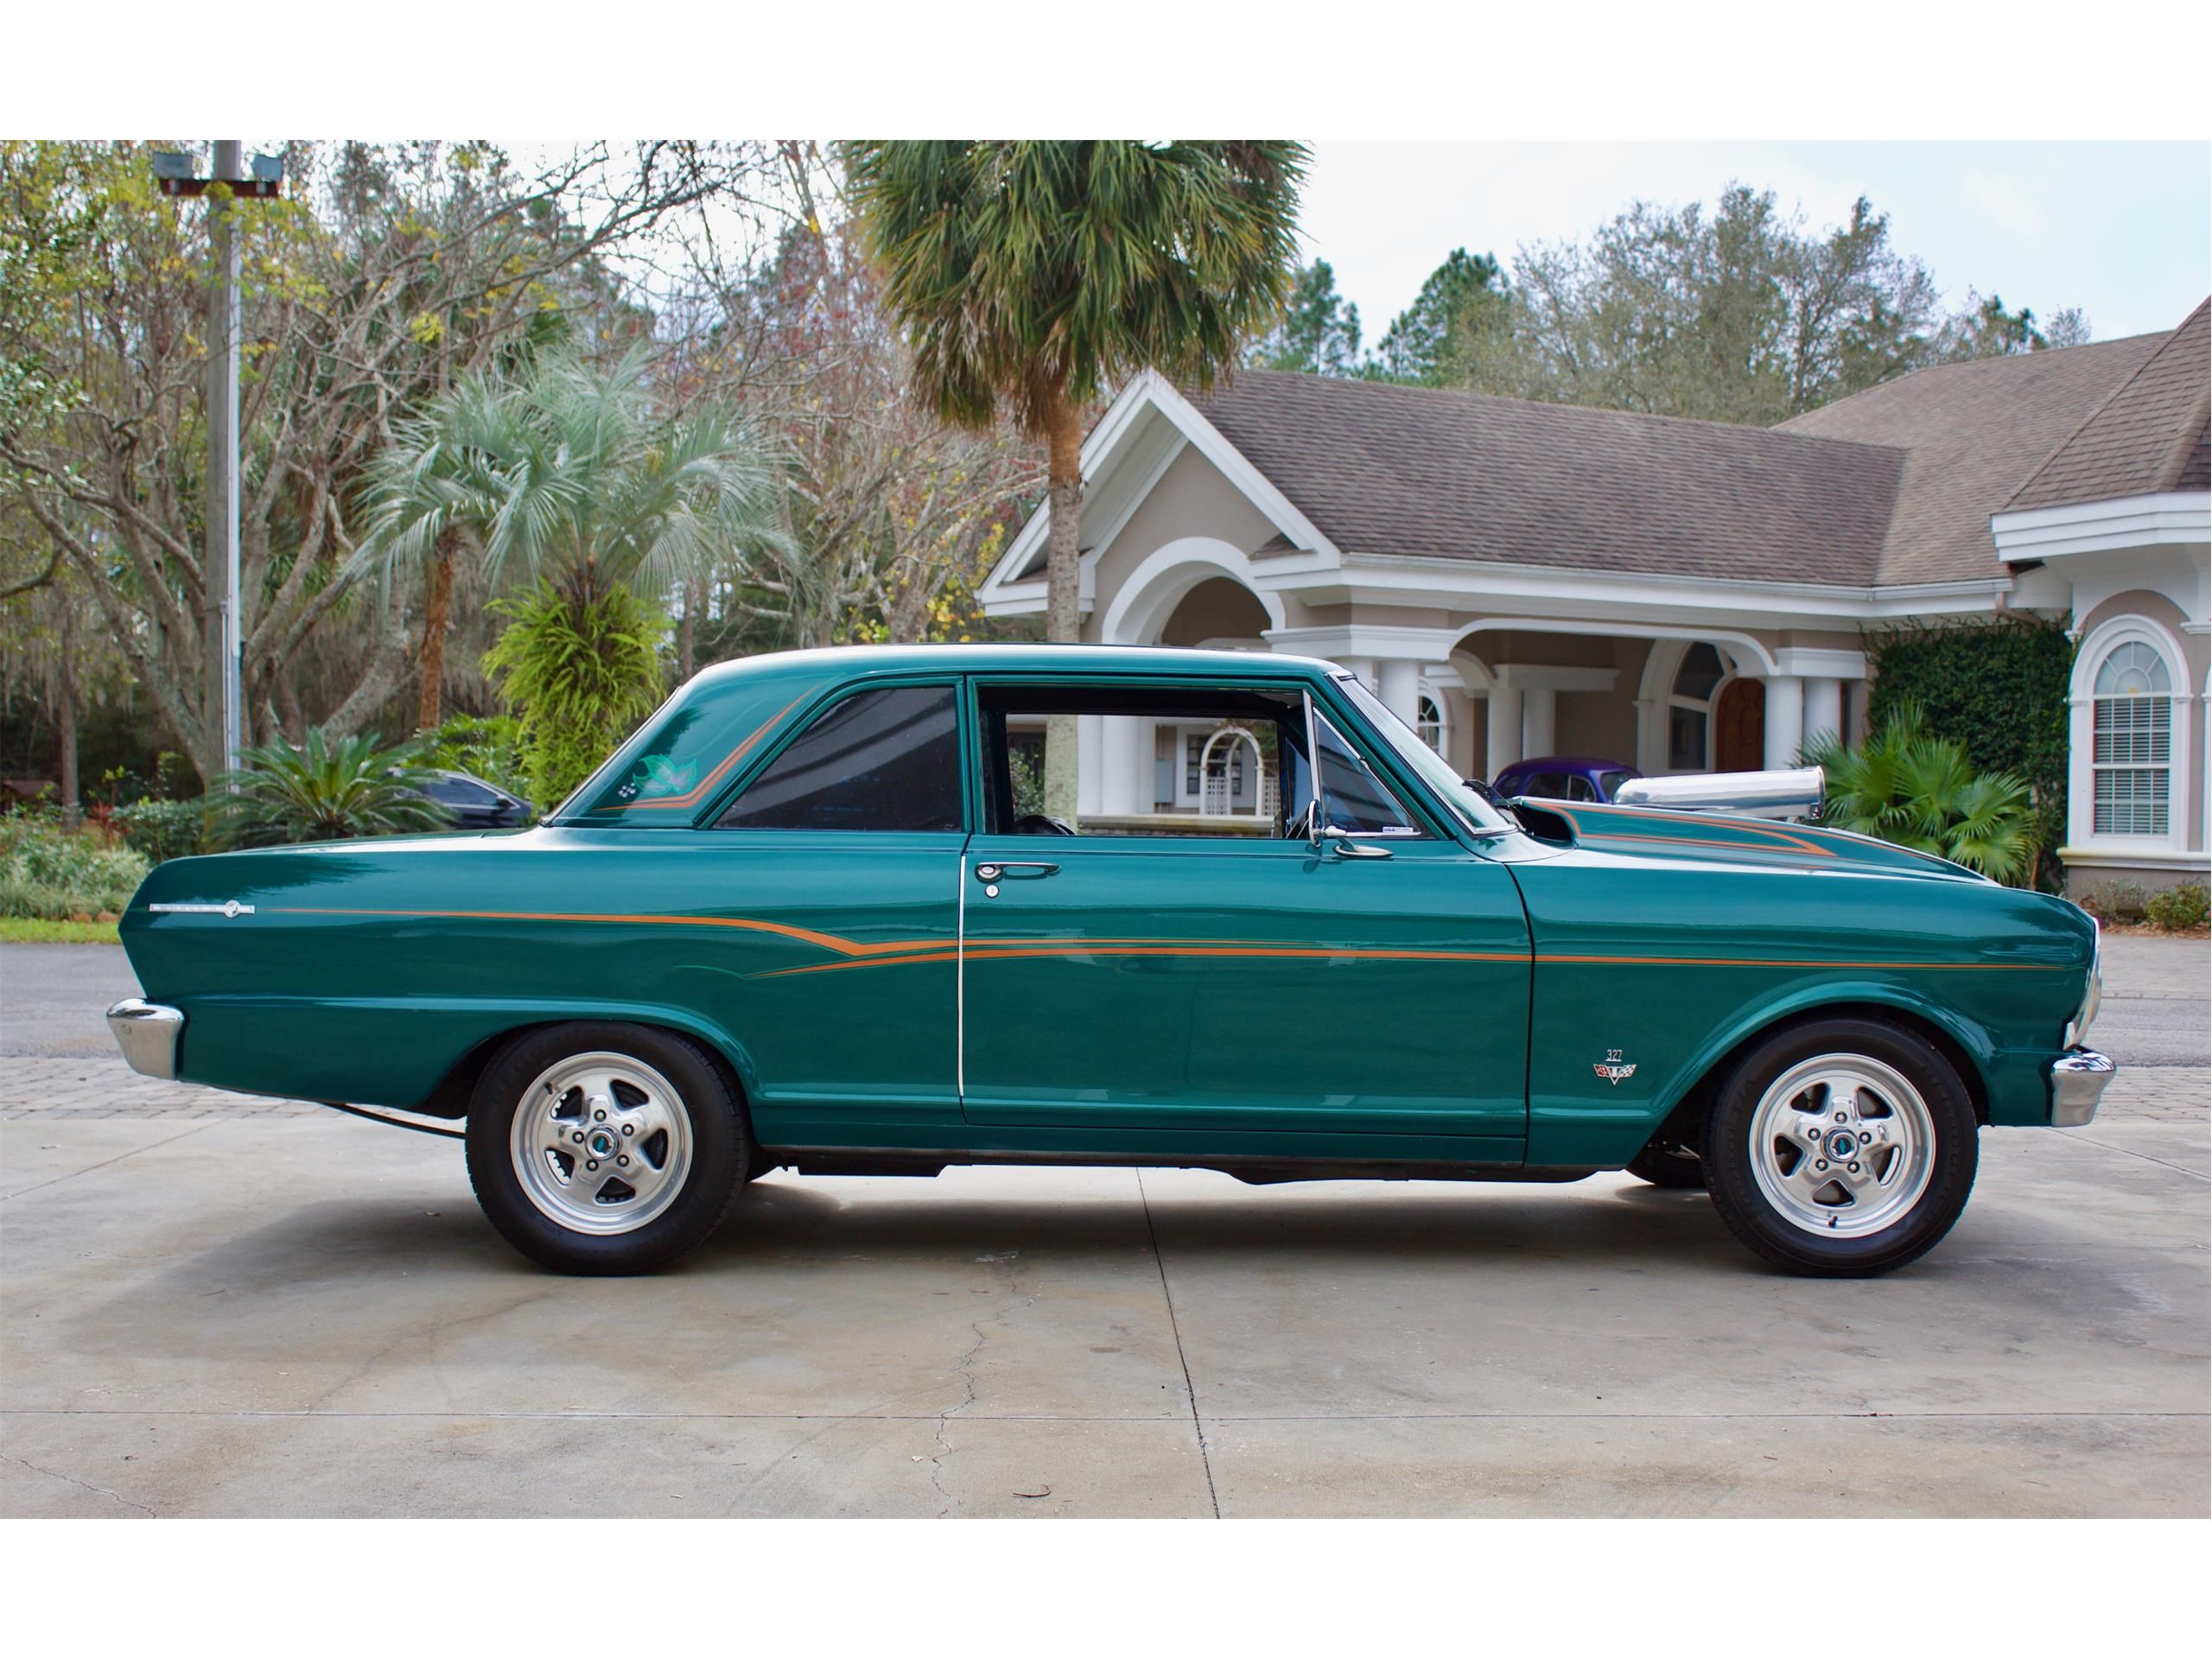 1965 Chevrolet Nova For Sale Listing Id Cc 1180361 Classiccars